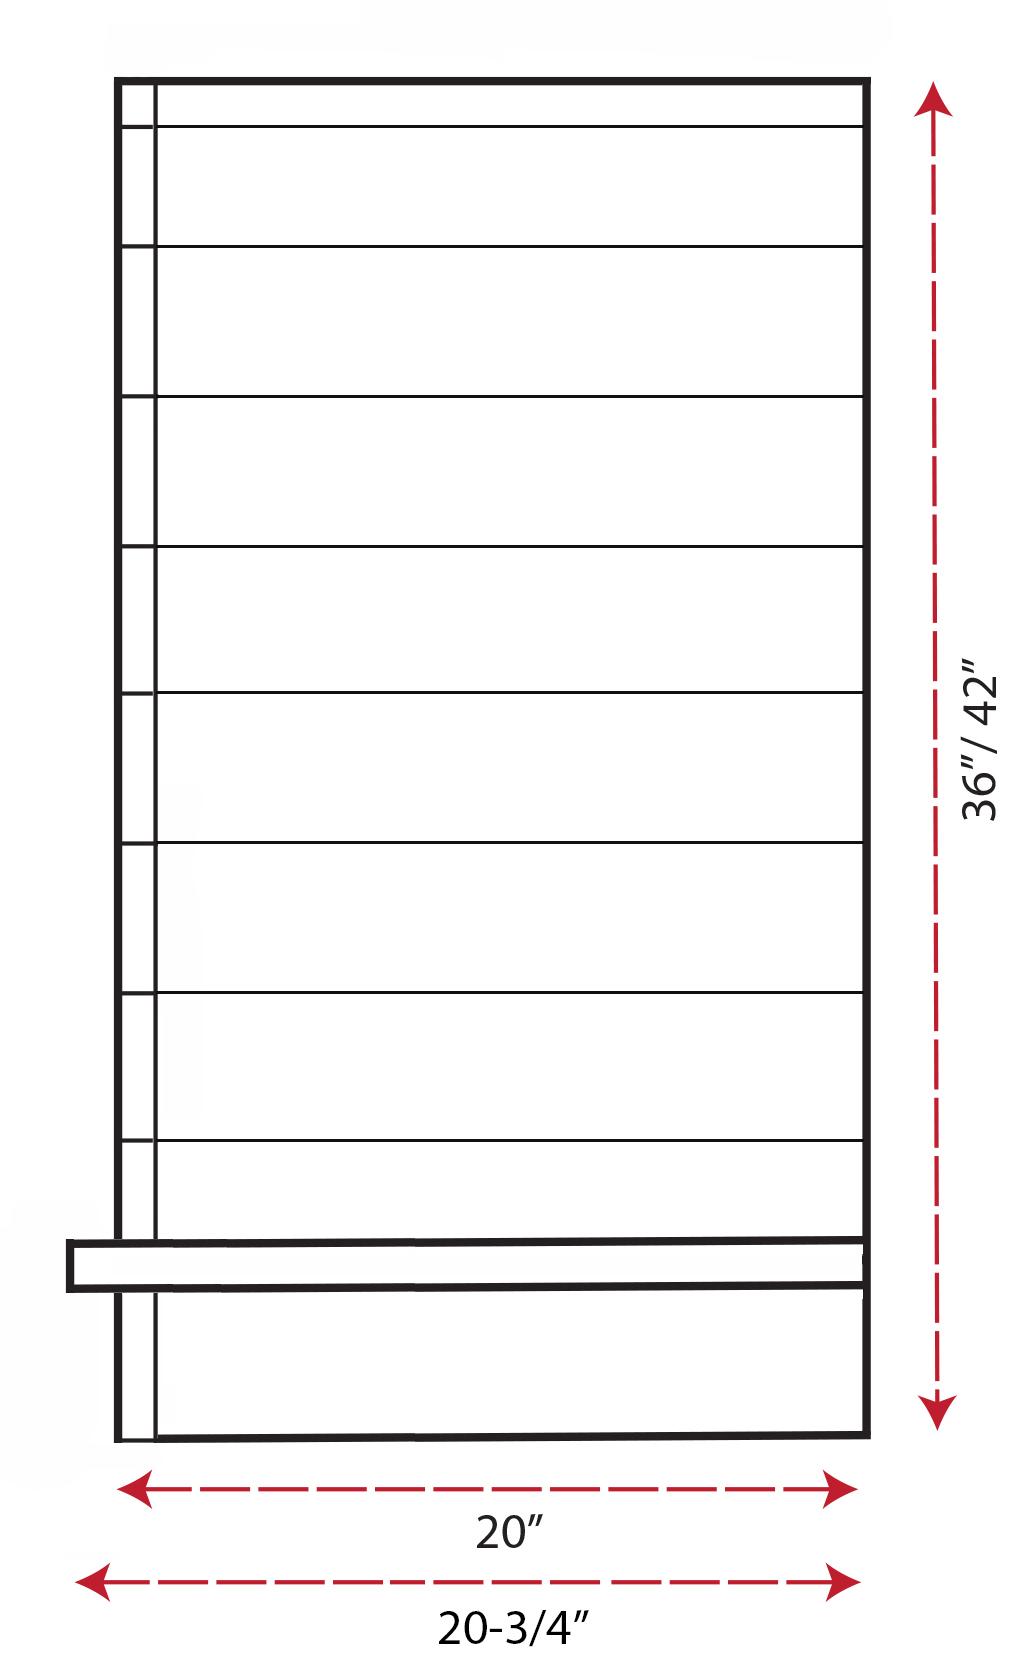 SY-WSLBA Shiplap Box Arch Hood (side view)